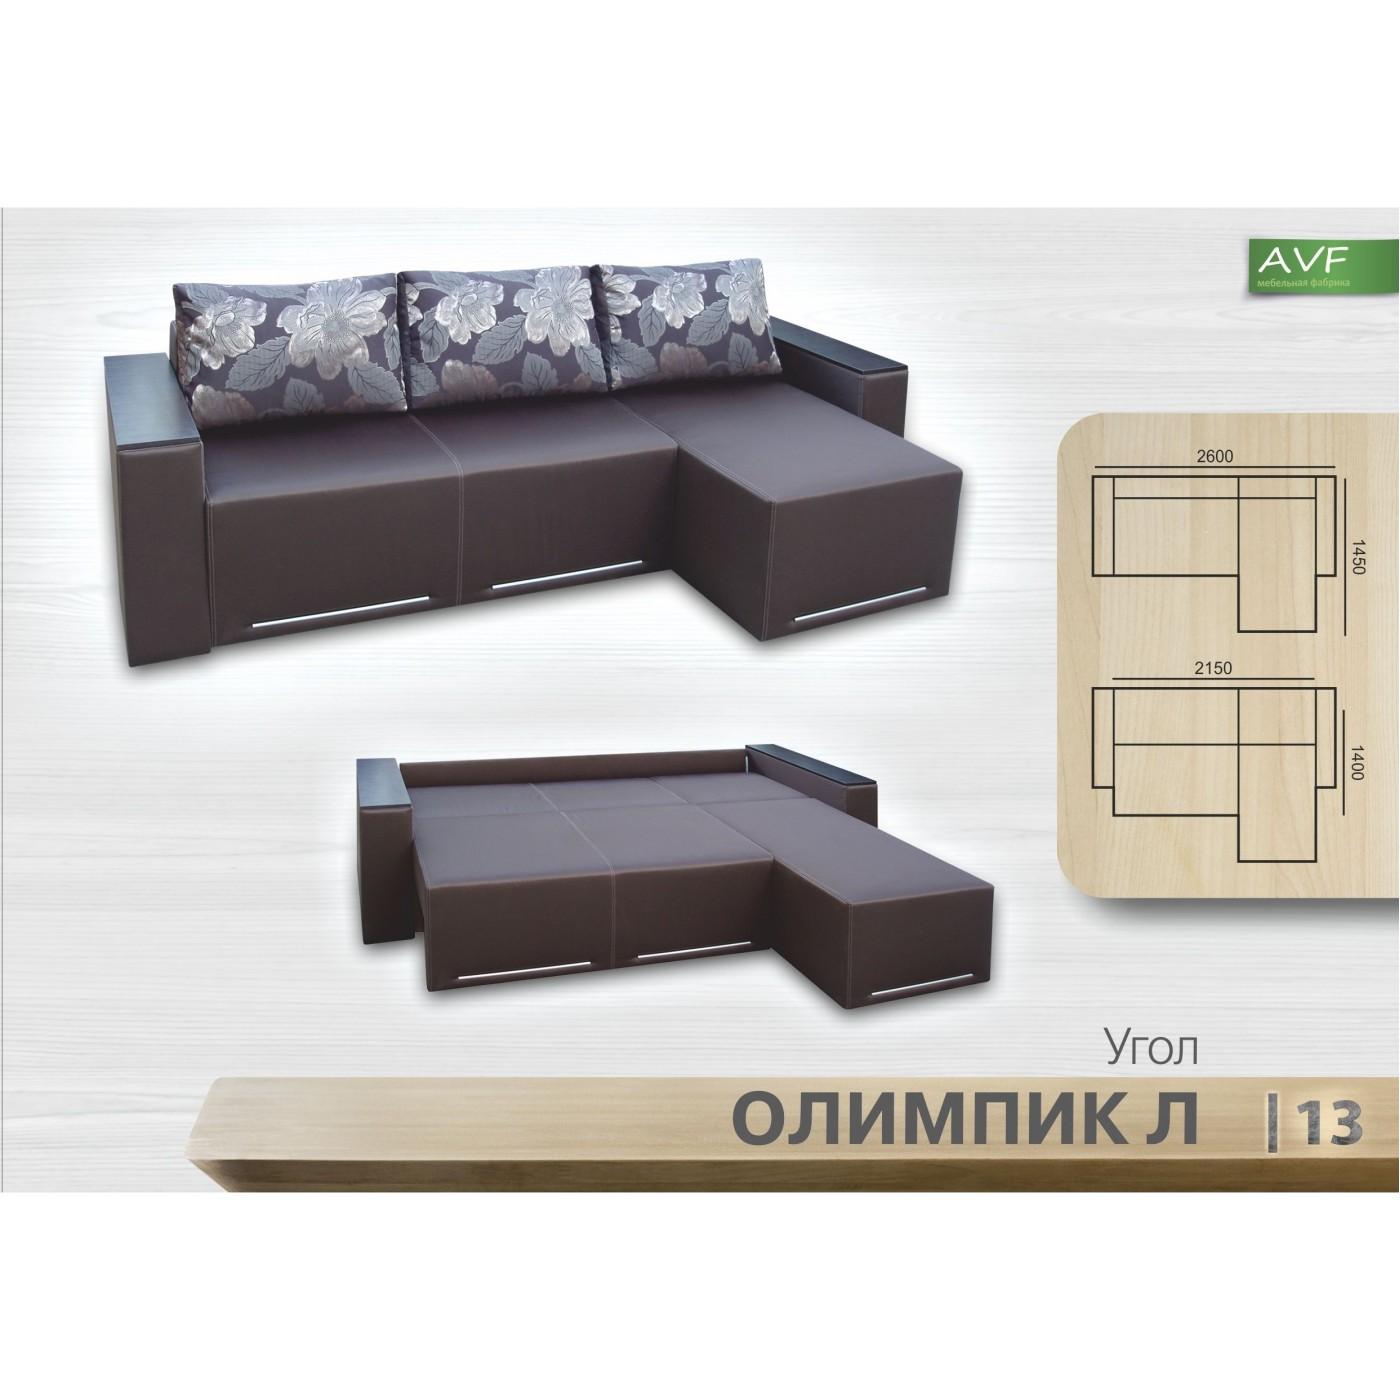 Угол Олимпик Л (пружинный блок, ламинат)